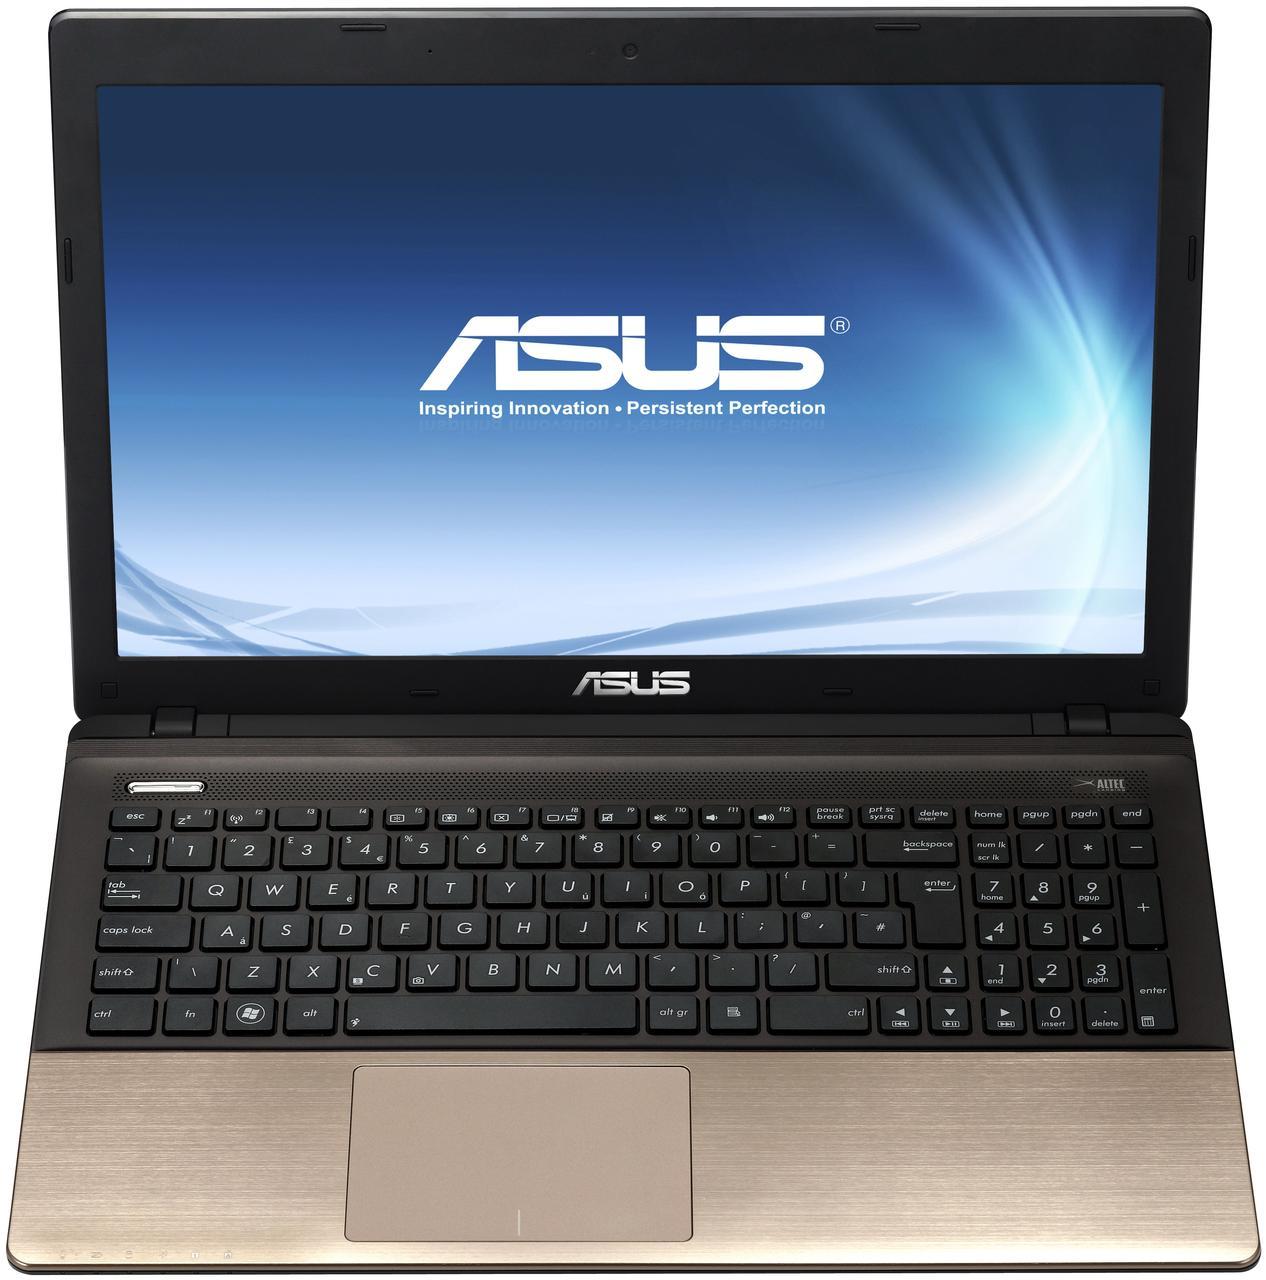 Ноутбук ASUS K55VJ-Intel Core i5-3210M-2.5GHz-4Gb-DDR3-320Gb-HDD-W15.6-Web-NVIDIA GeForce GT635M(2Gb)-(B)- Б/У